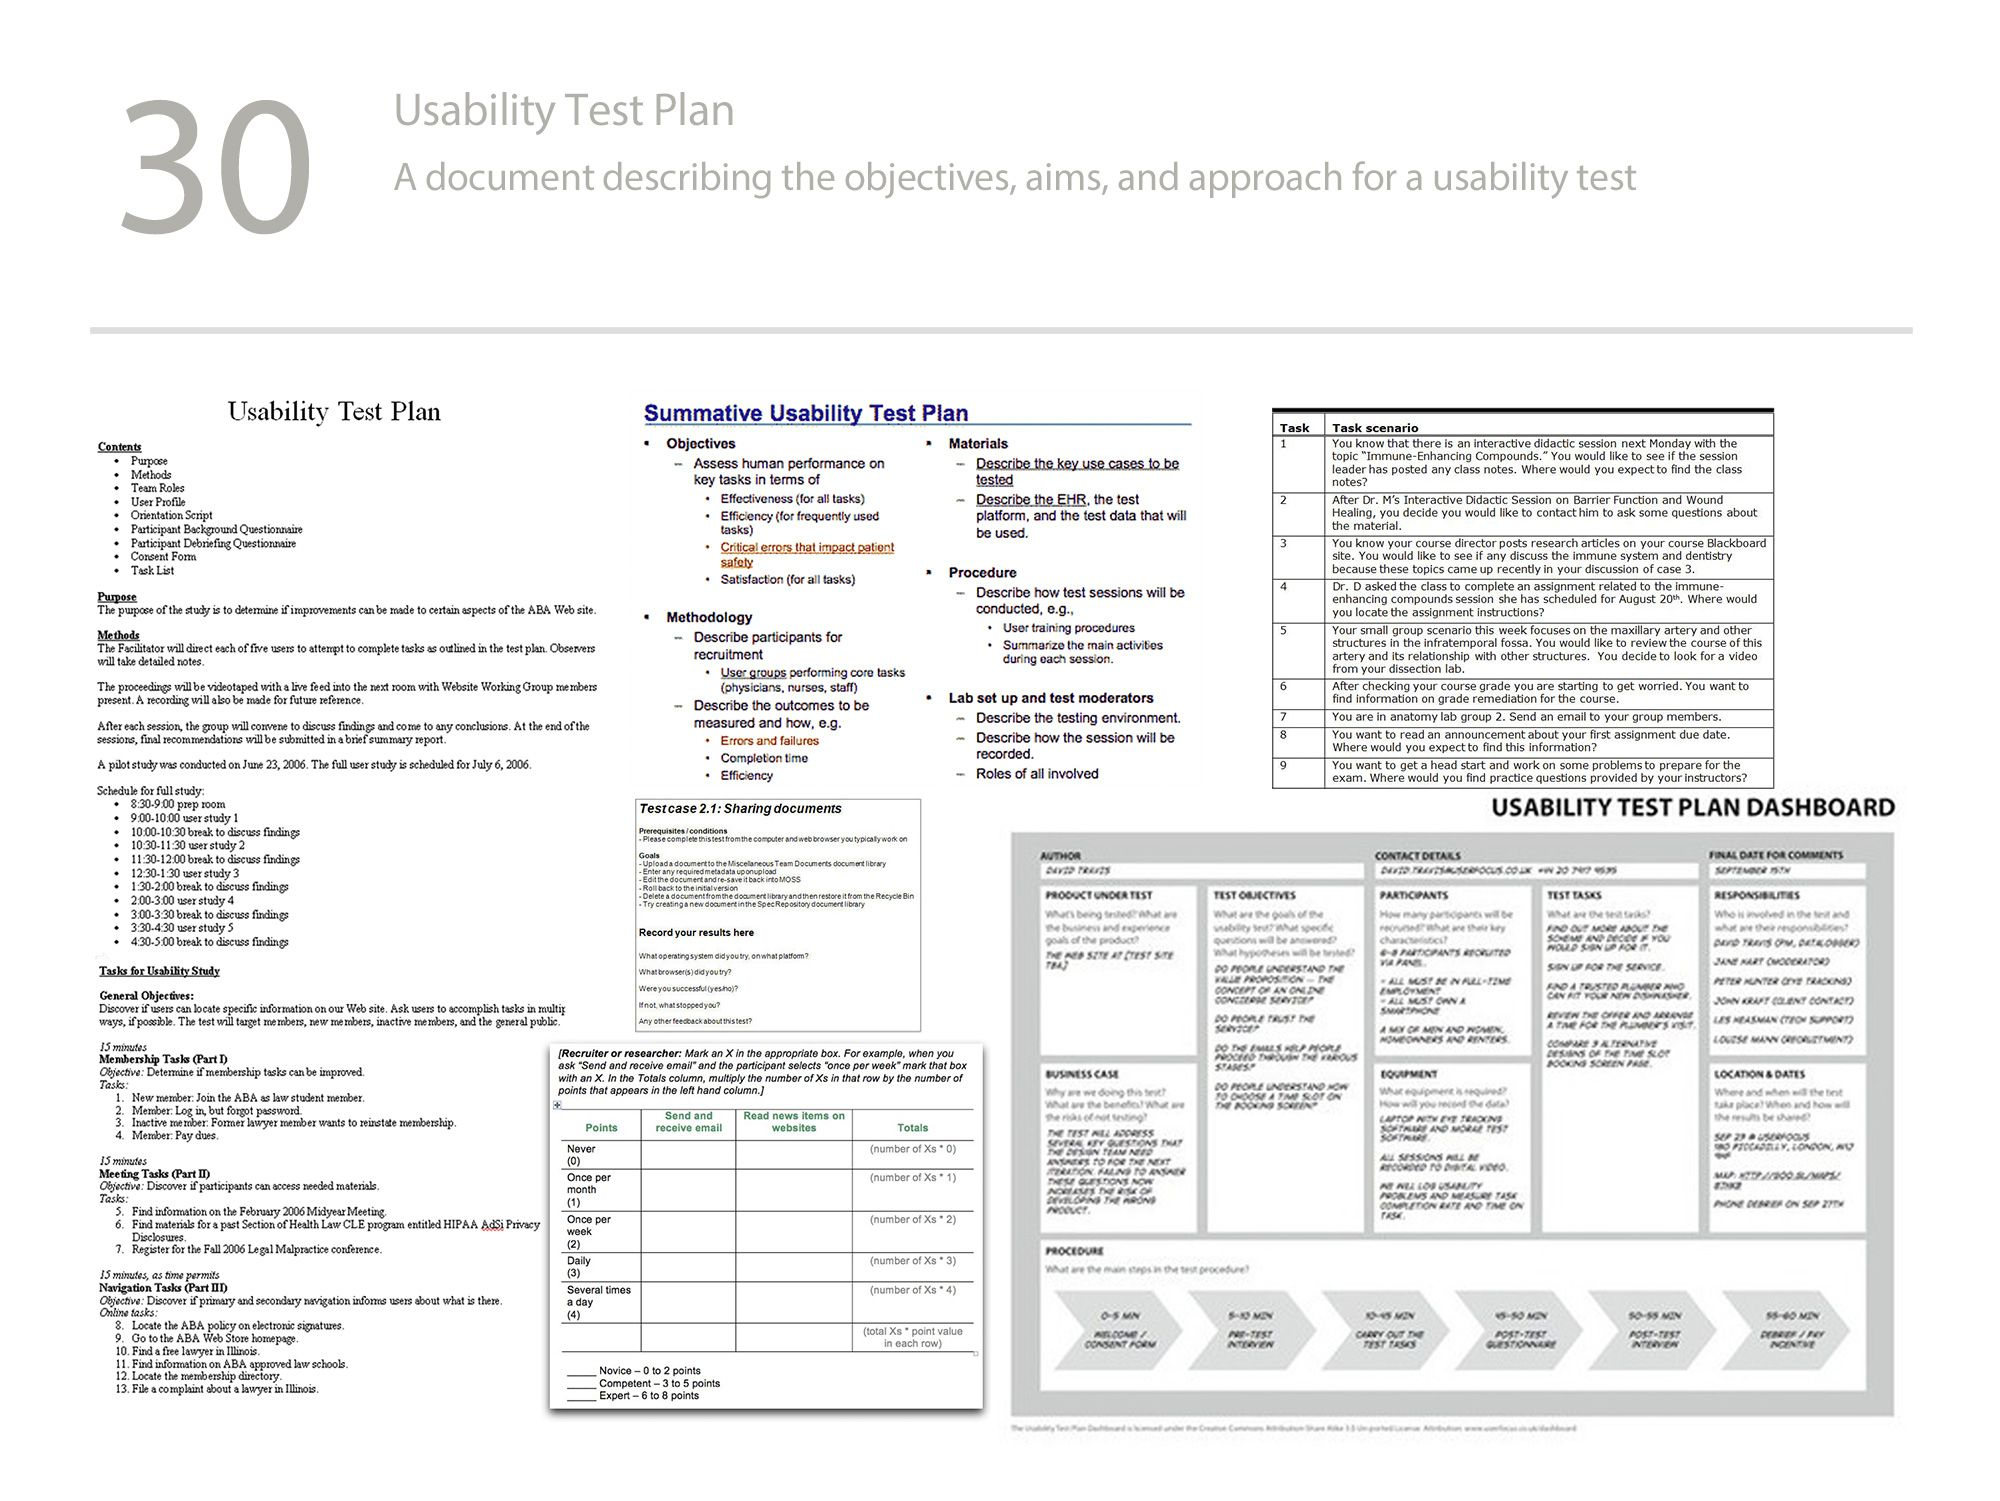 Usability Test Plan Dashboard  Uxd Stuff    Test Plan